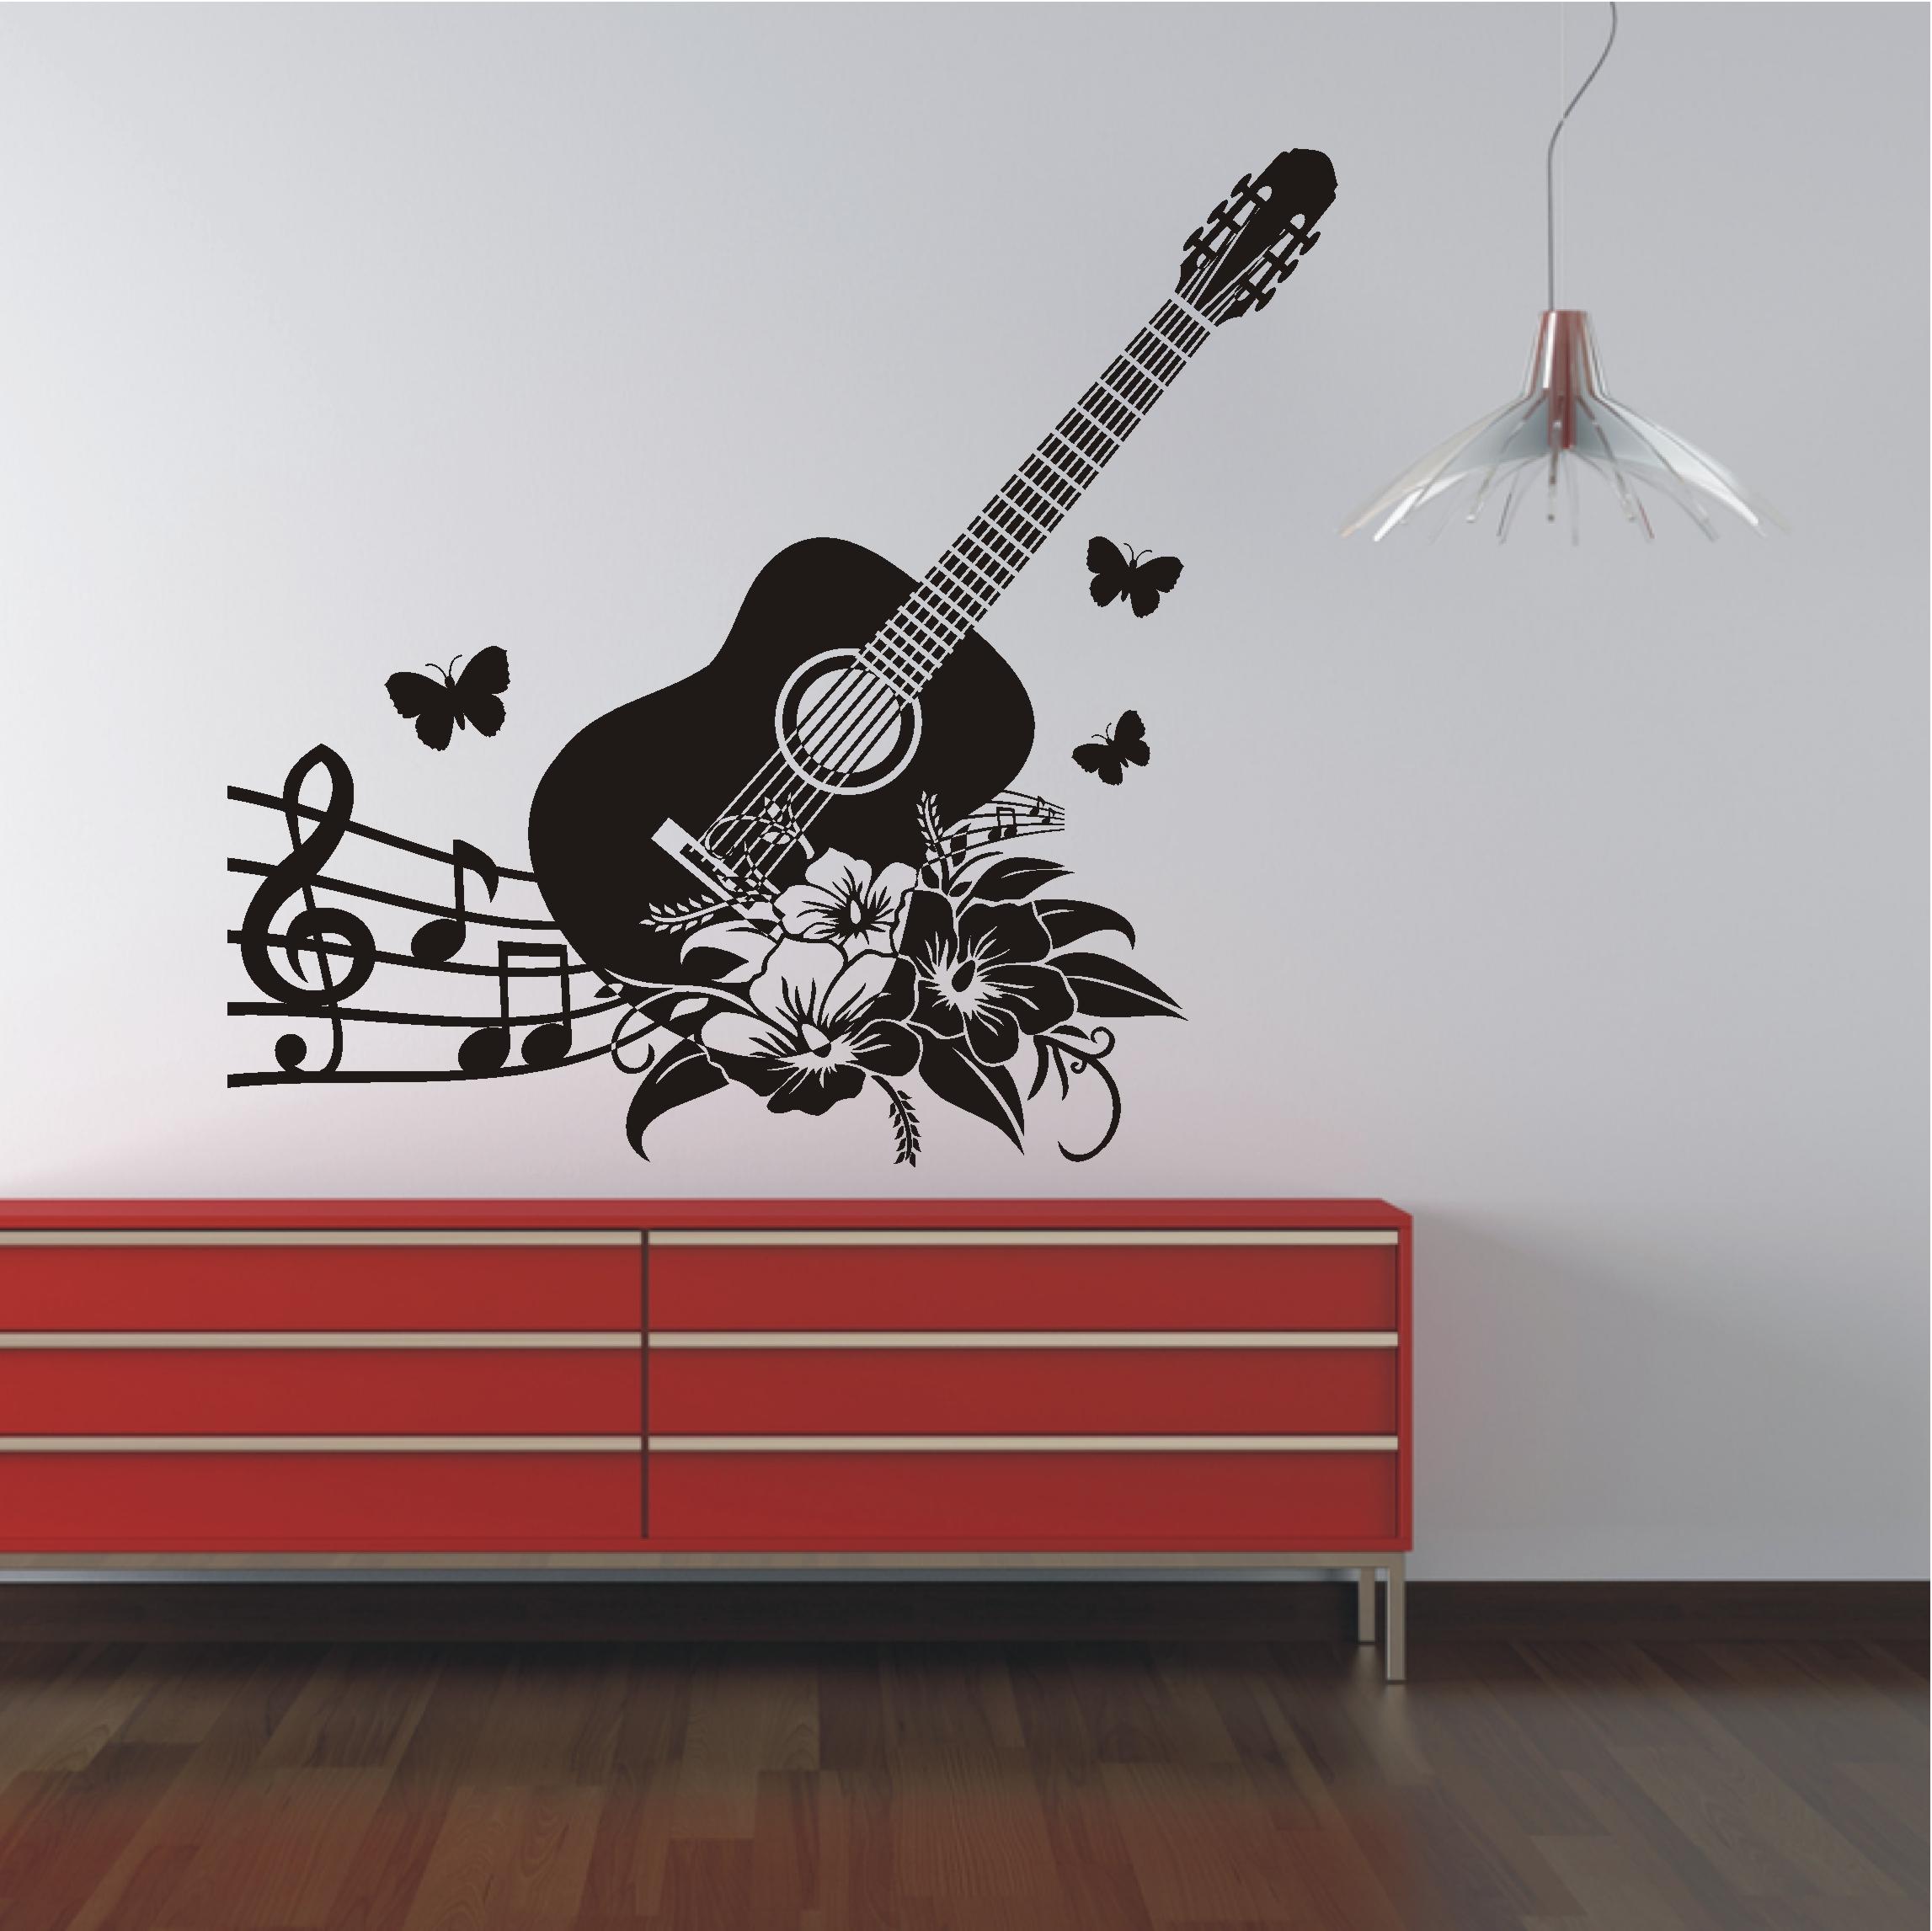 deko-shop-24.de - wandtattoo-gitarre mit noten-deko-shop-24.de, Schlafzimmer design